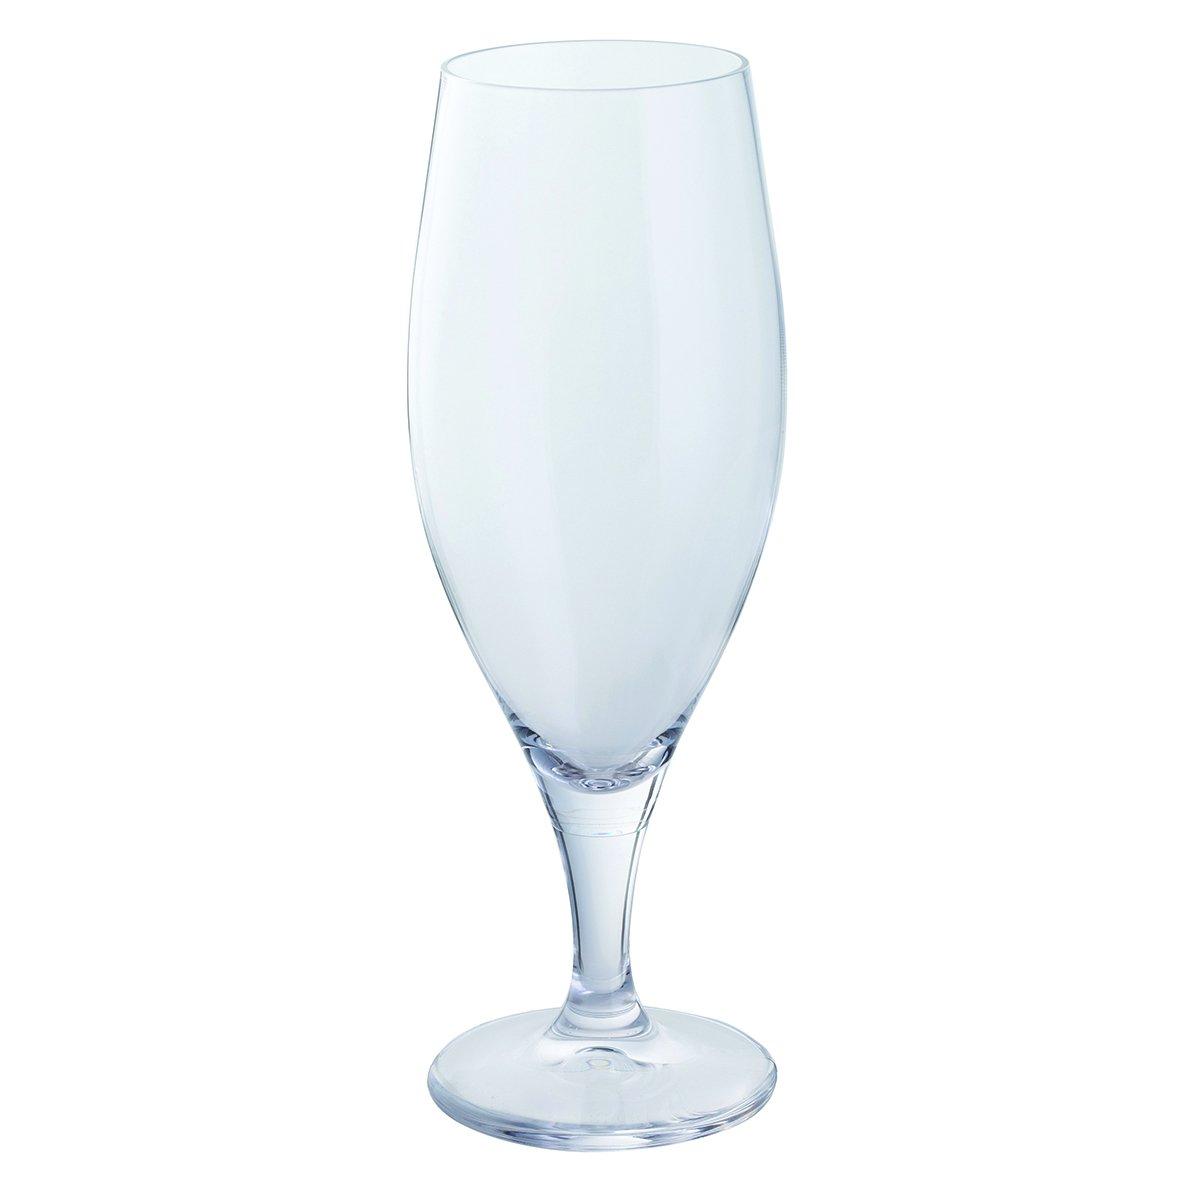 Dartington 2-Piece Crystal Wine and Bar Beer Glass Dartington Crystal WB415/P